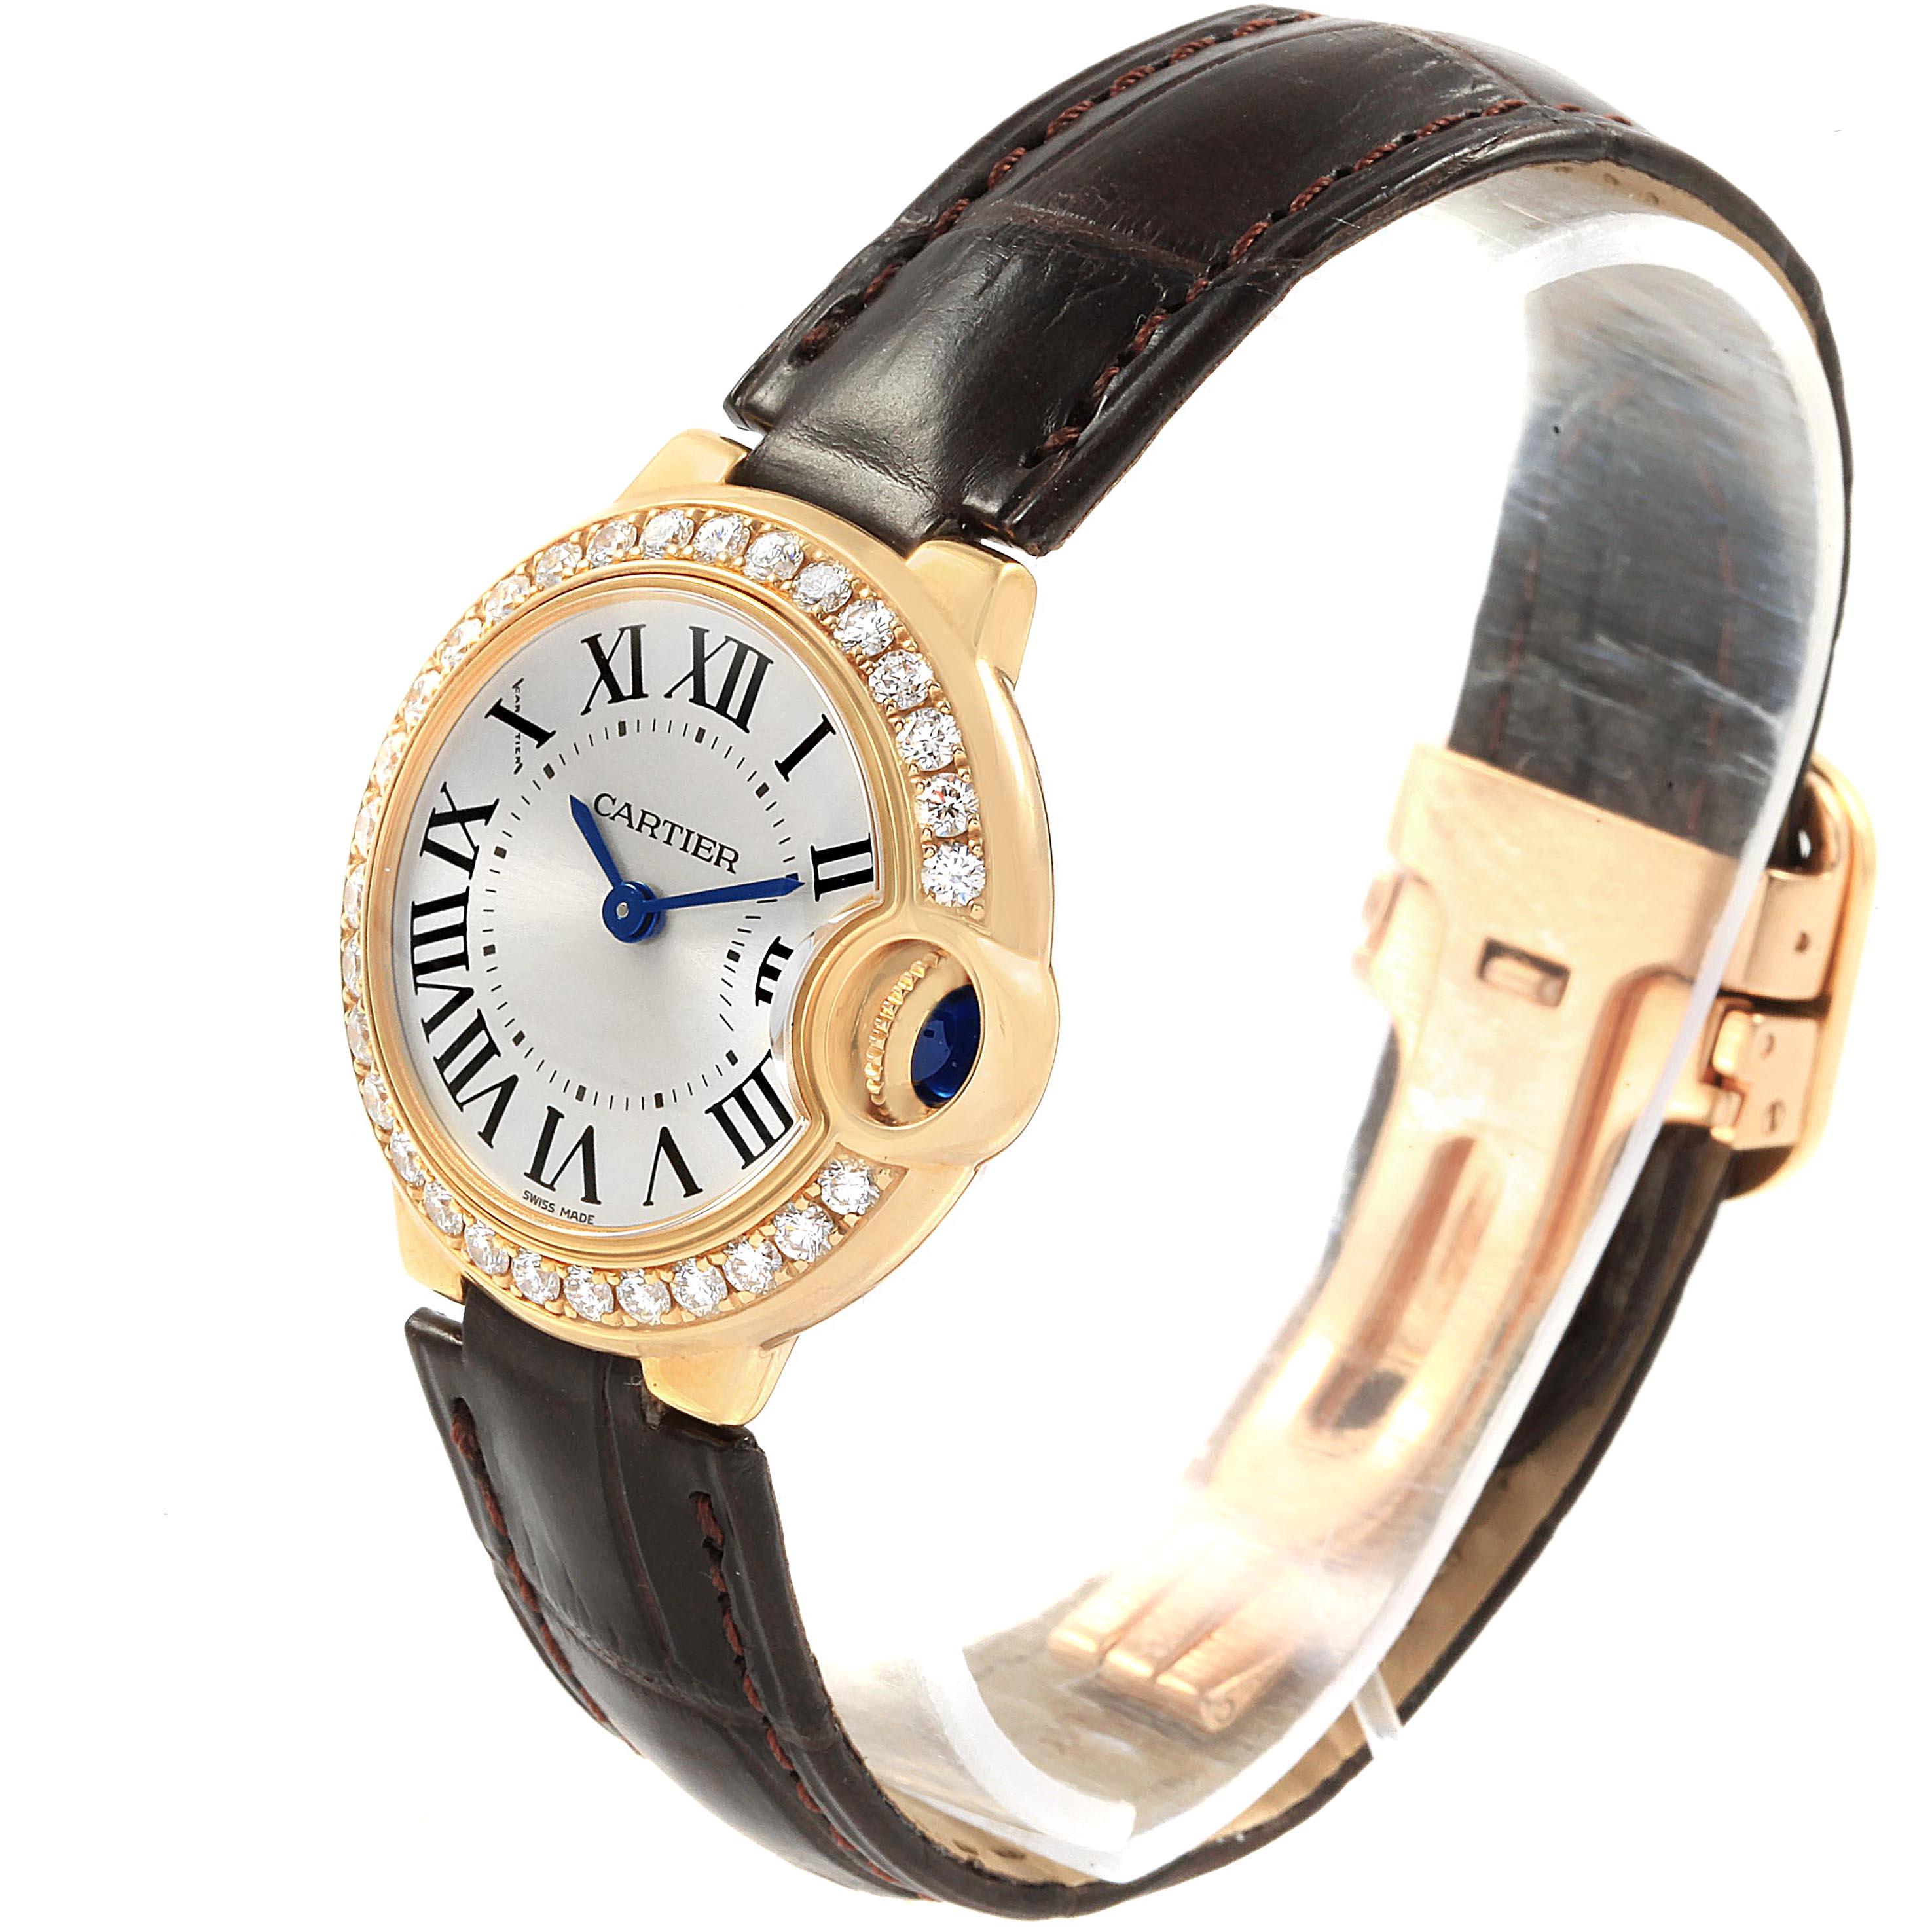 Cartier Ballon Bleu 28mm Yellow Gold Diamond Ladies Watch WE900151 Unworn SwissWatchExpo